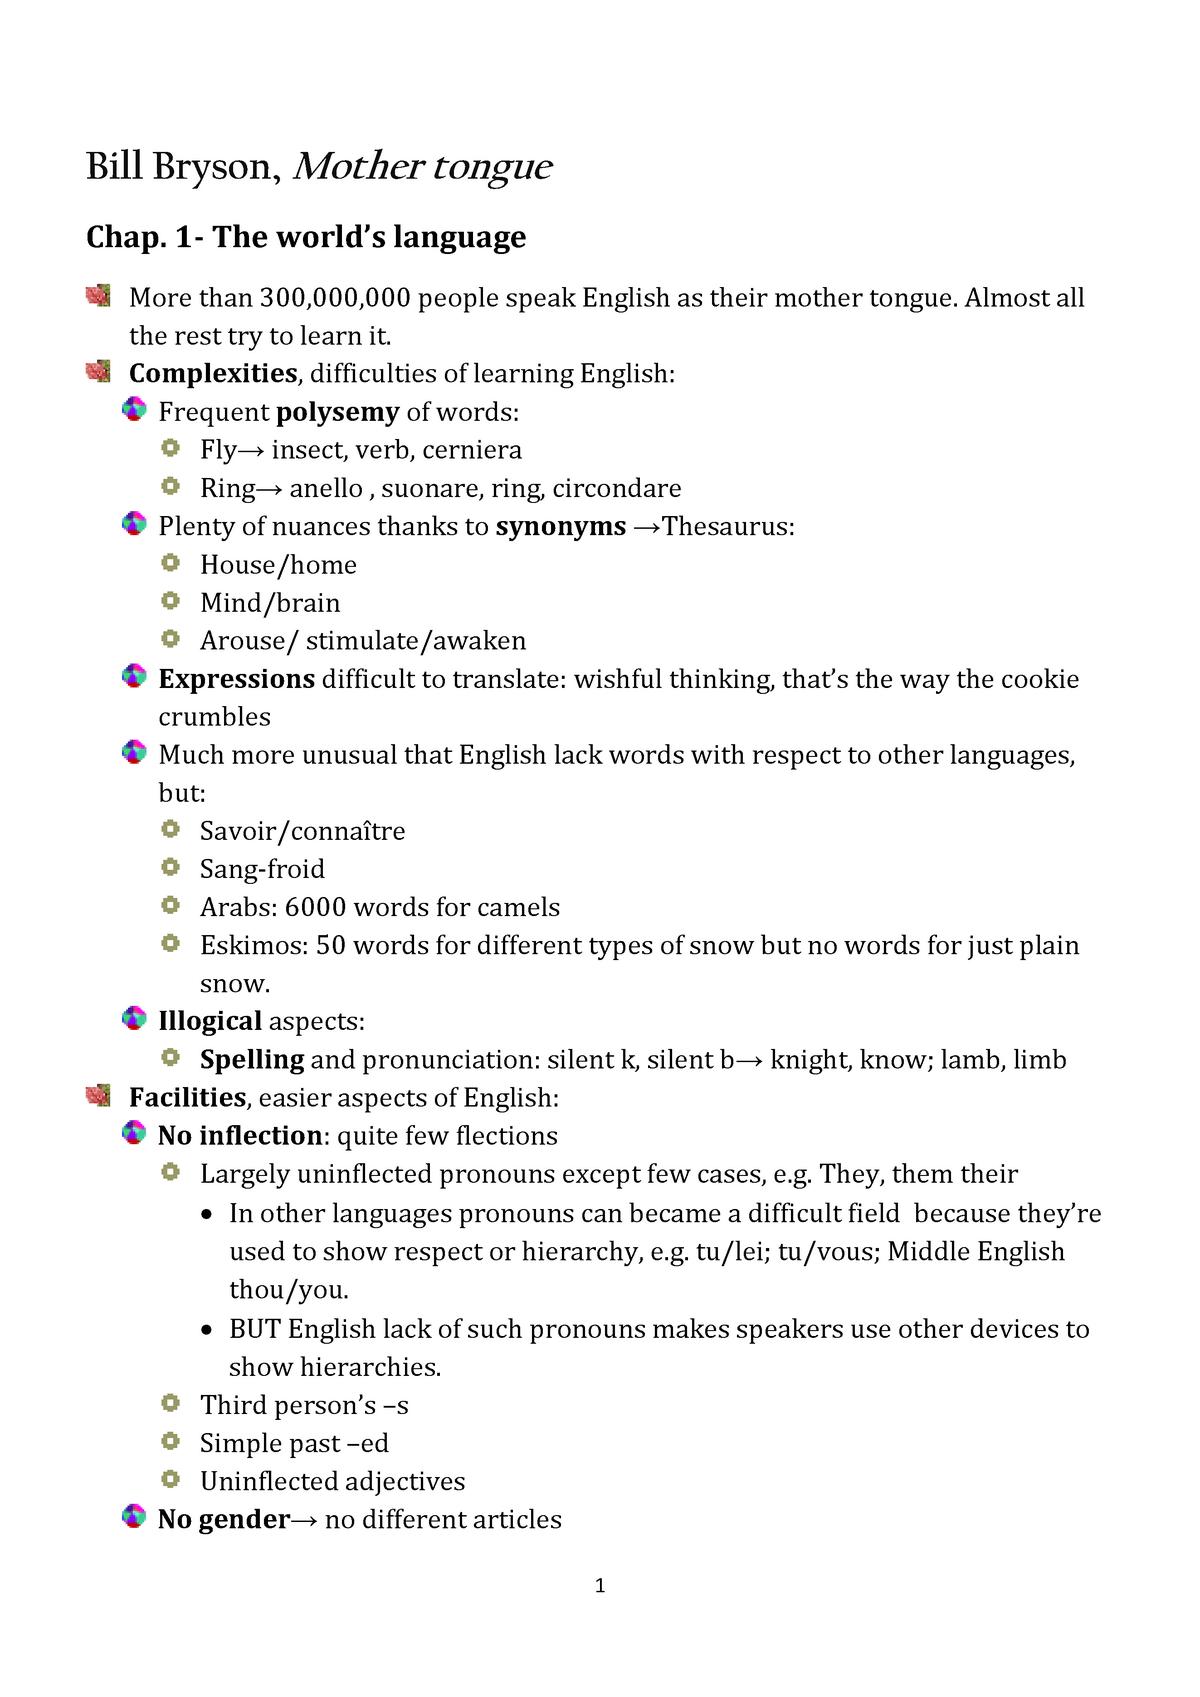 Bill bryson mother tongue riassunto - Lingua Inglese - StuDocu